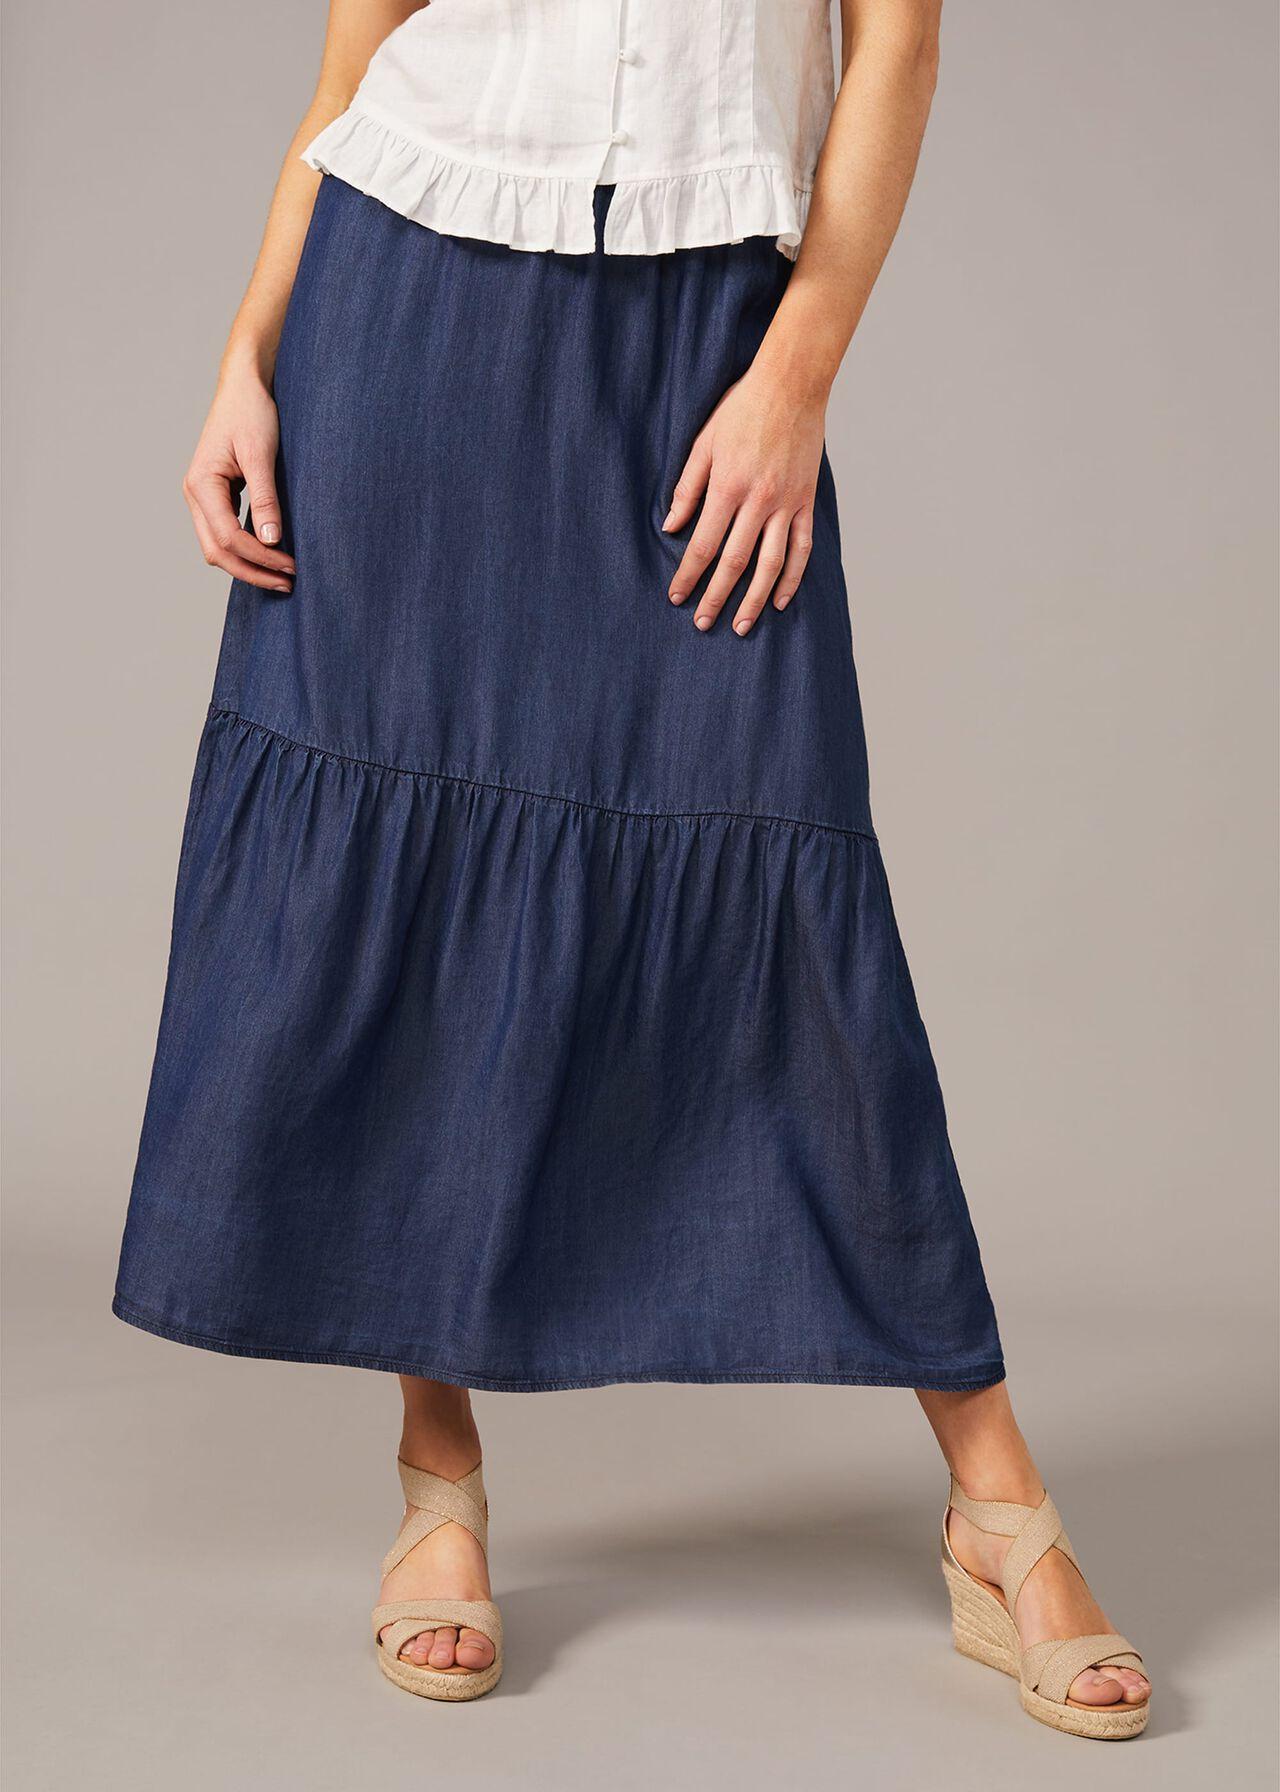 Janey Chambray Skirt